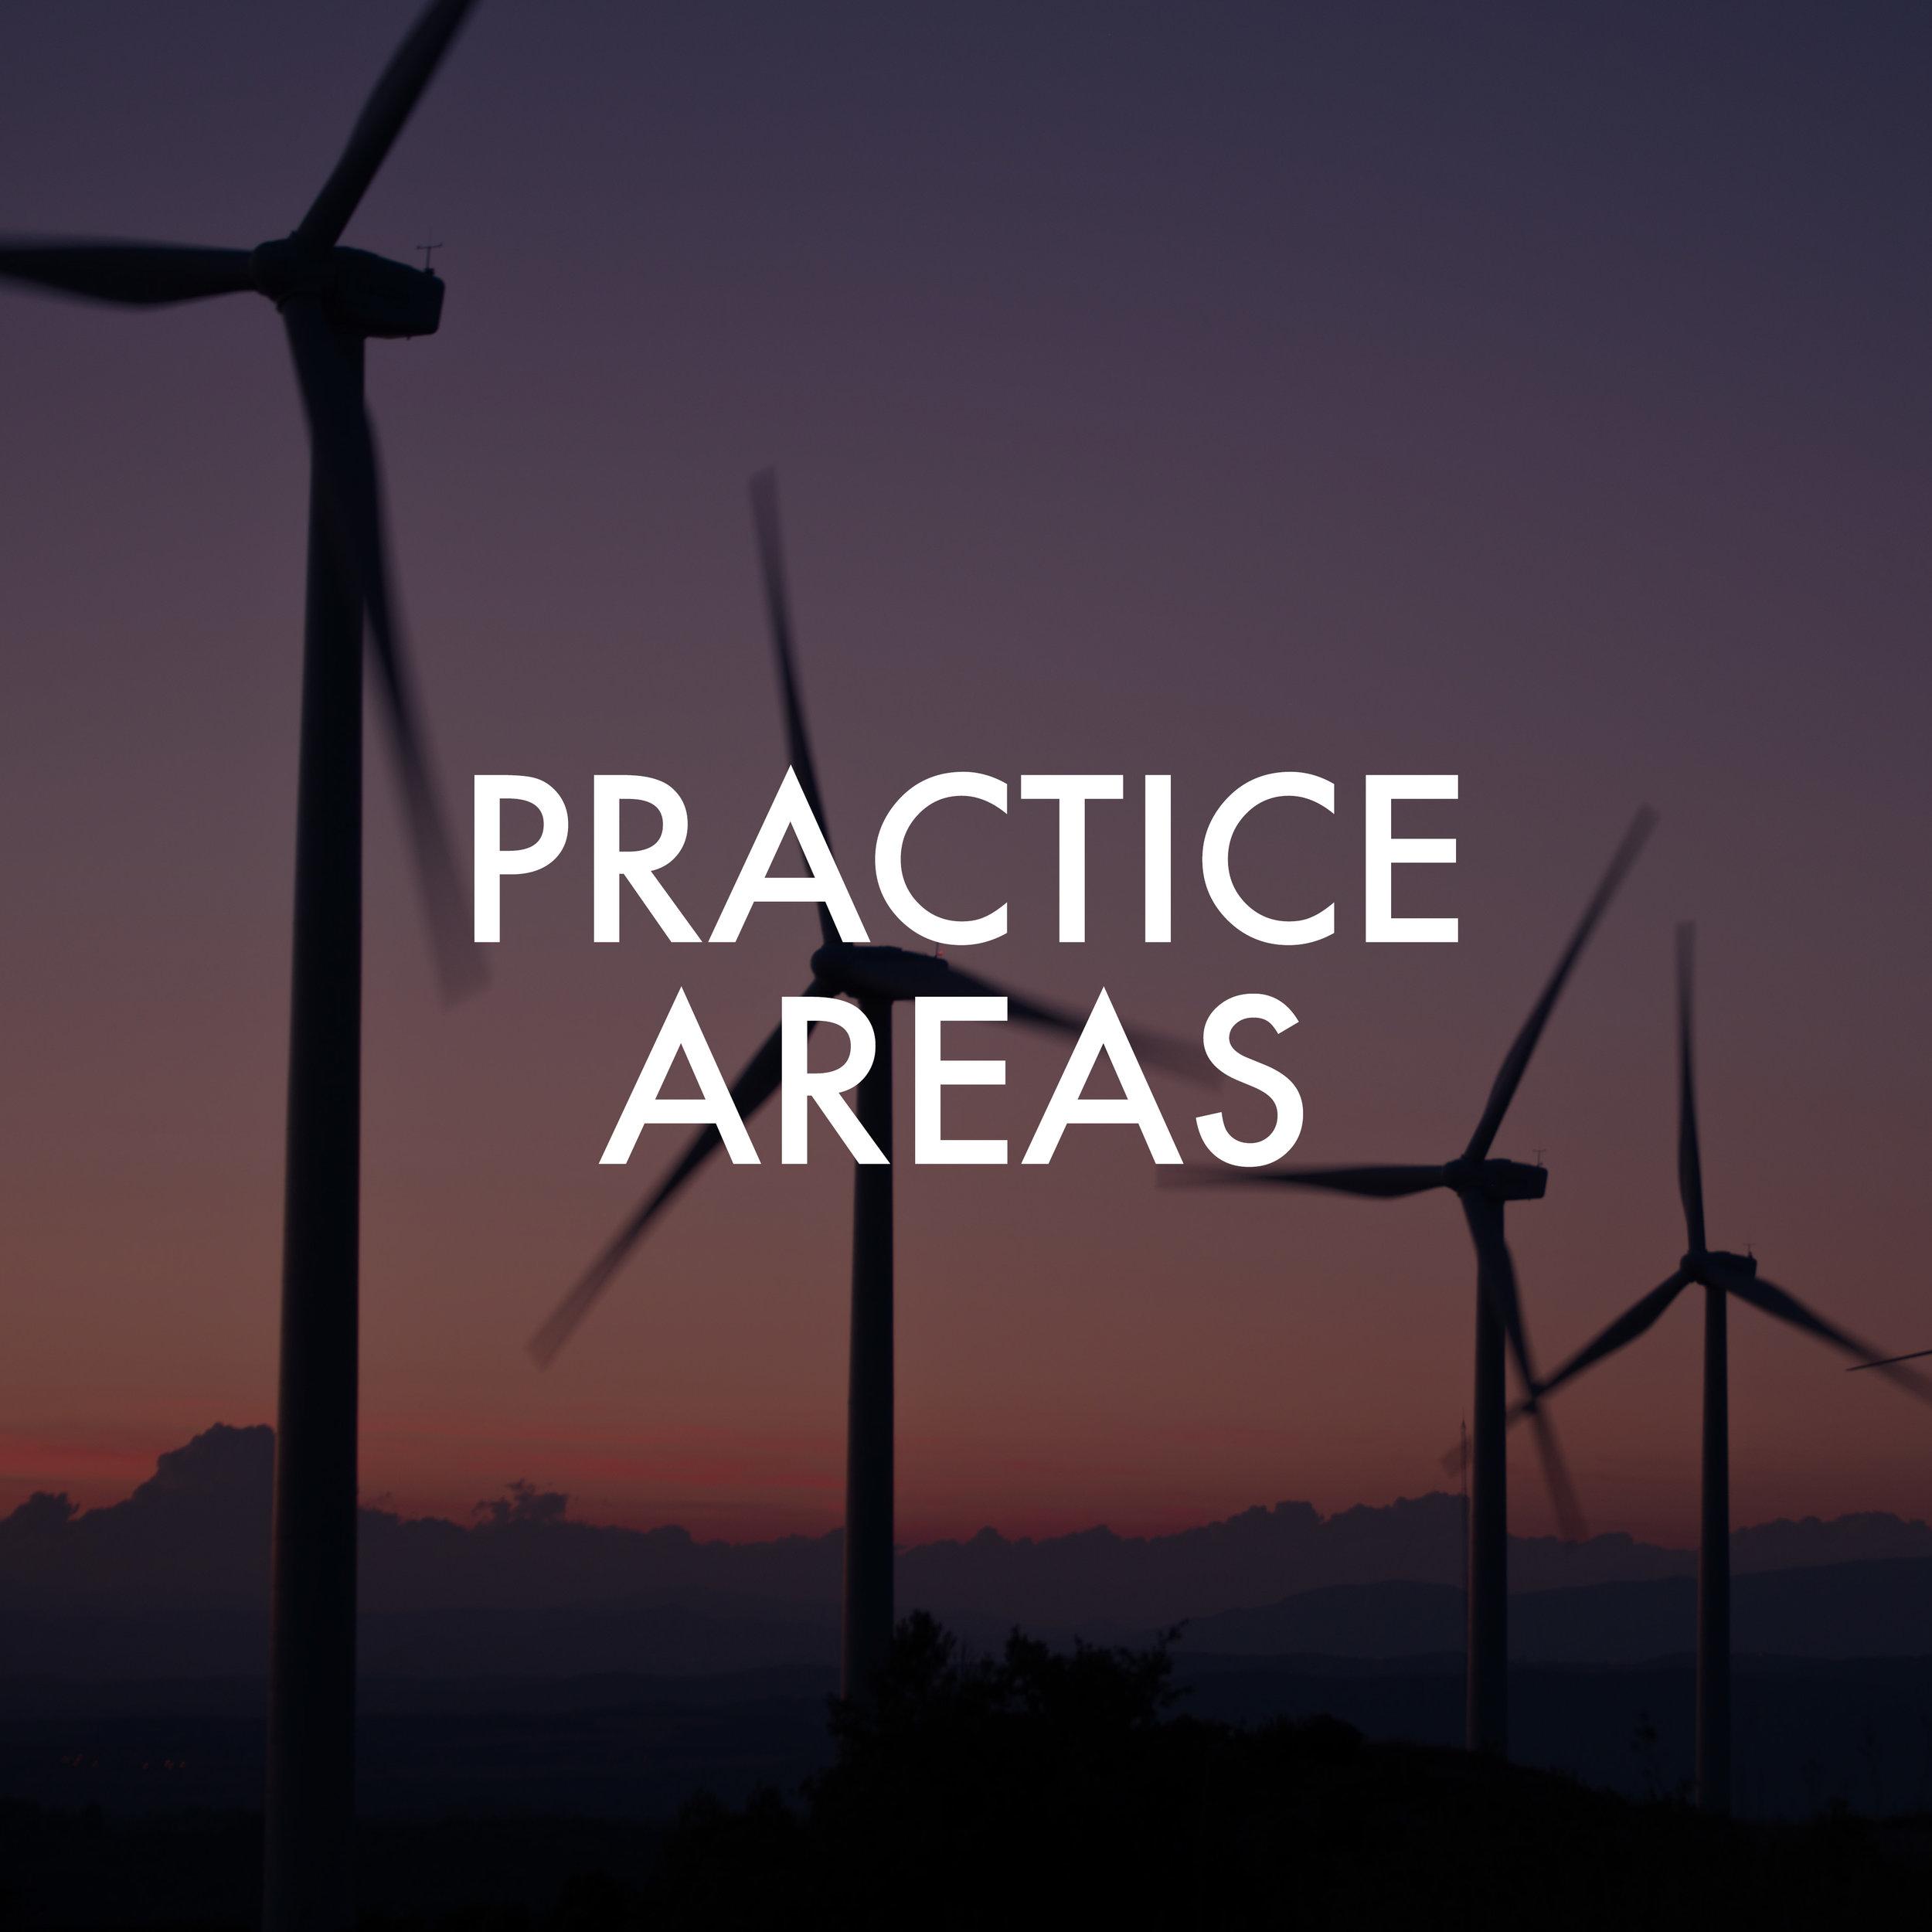 practice areas.jpg